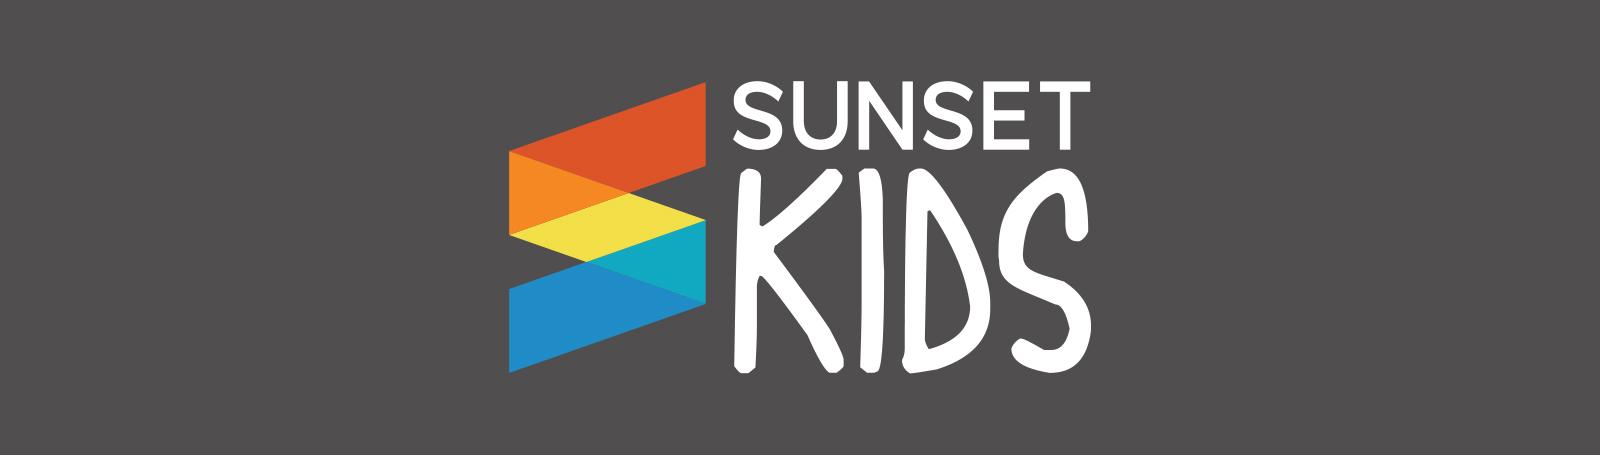 miami-church-sunset-kids.jpg